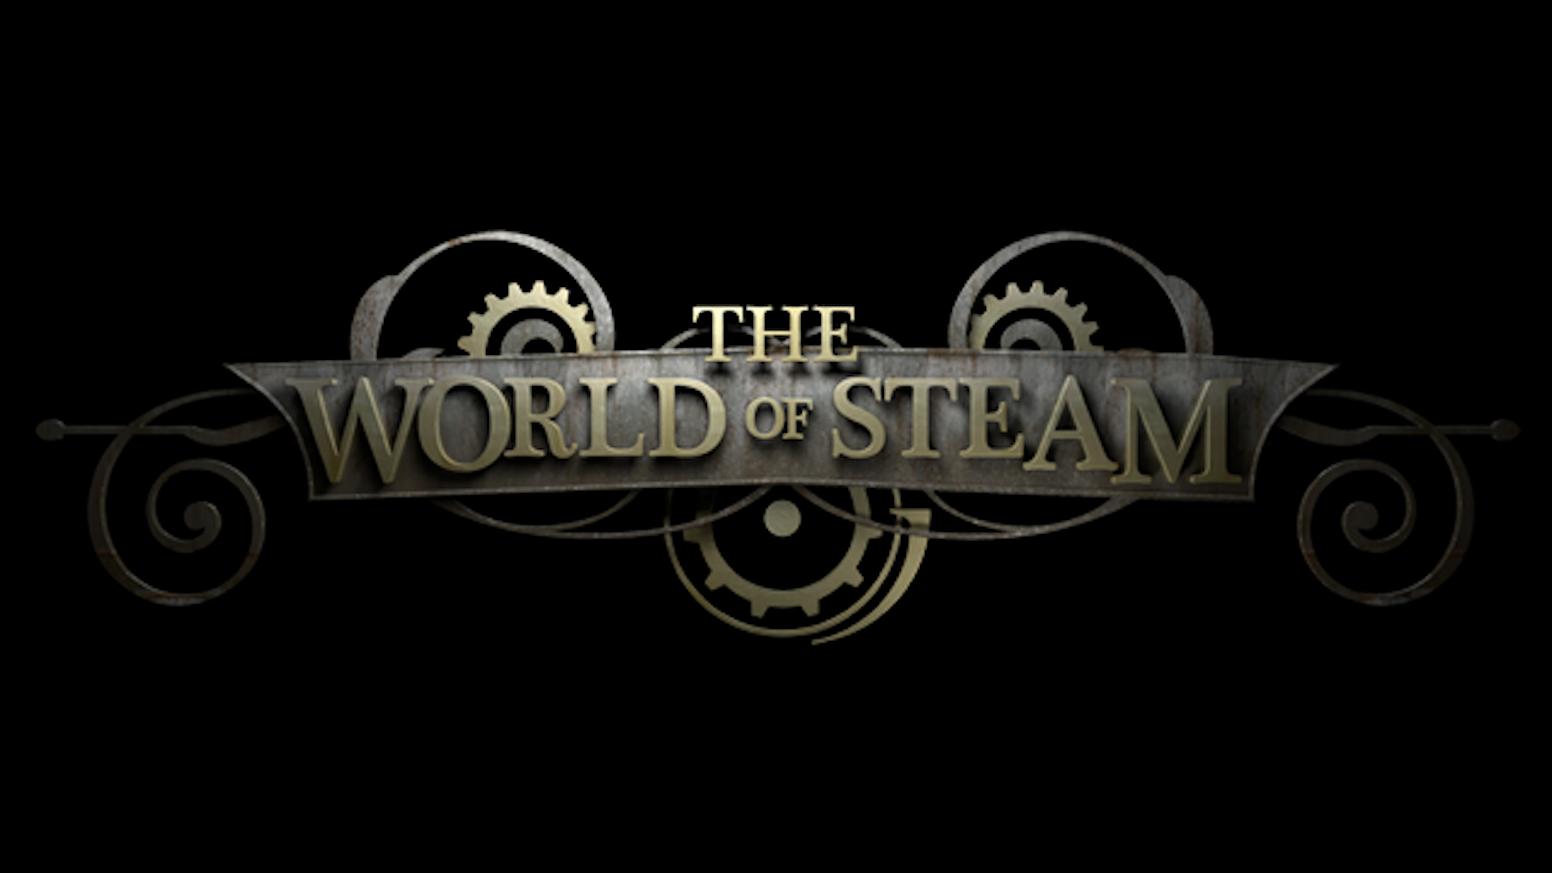 The World Of Steam By Matt King Kickstarter Holder Scraf Silvertone Metal Sci Fi Fashion Circuit Board Is A Set Twilight Zone Like Episodes In